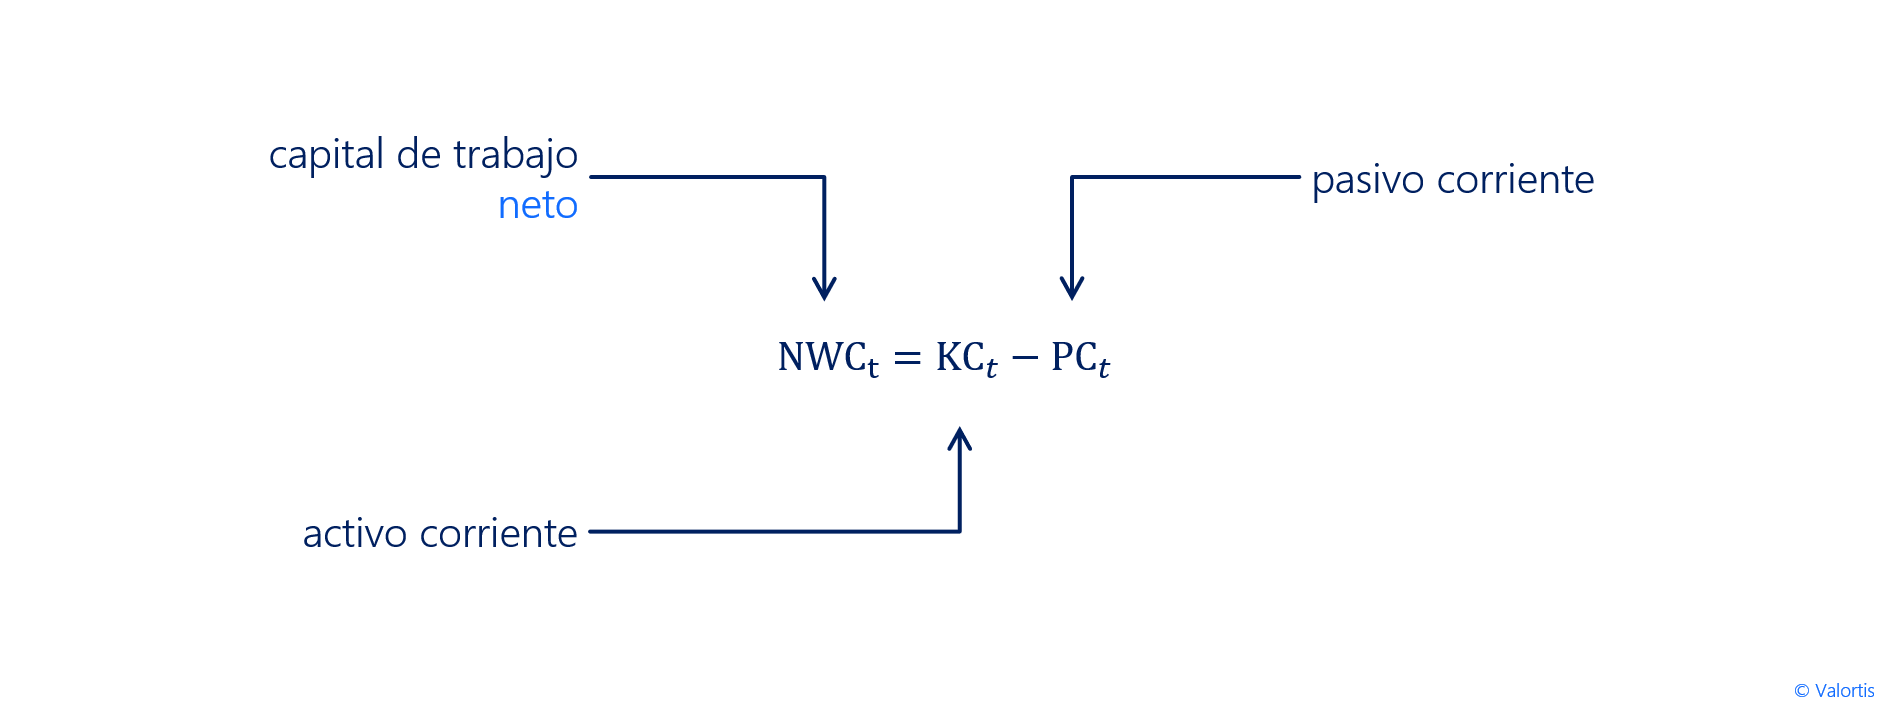 formula - capital de trabajo neto